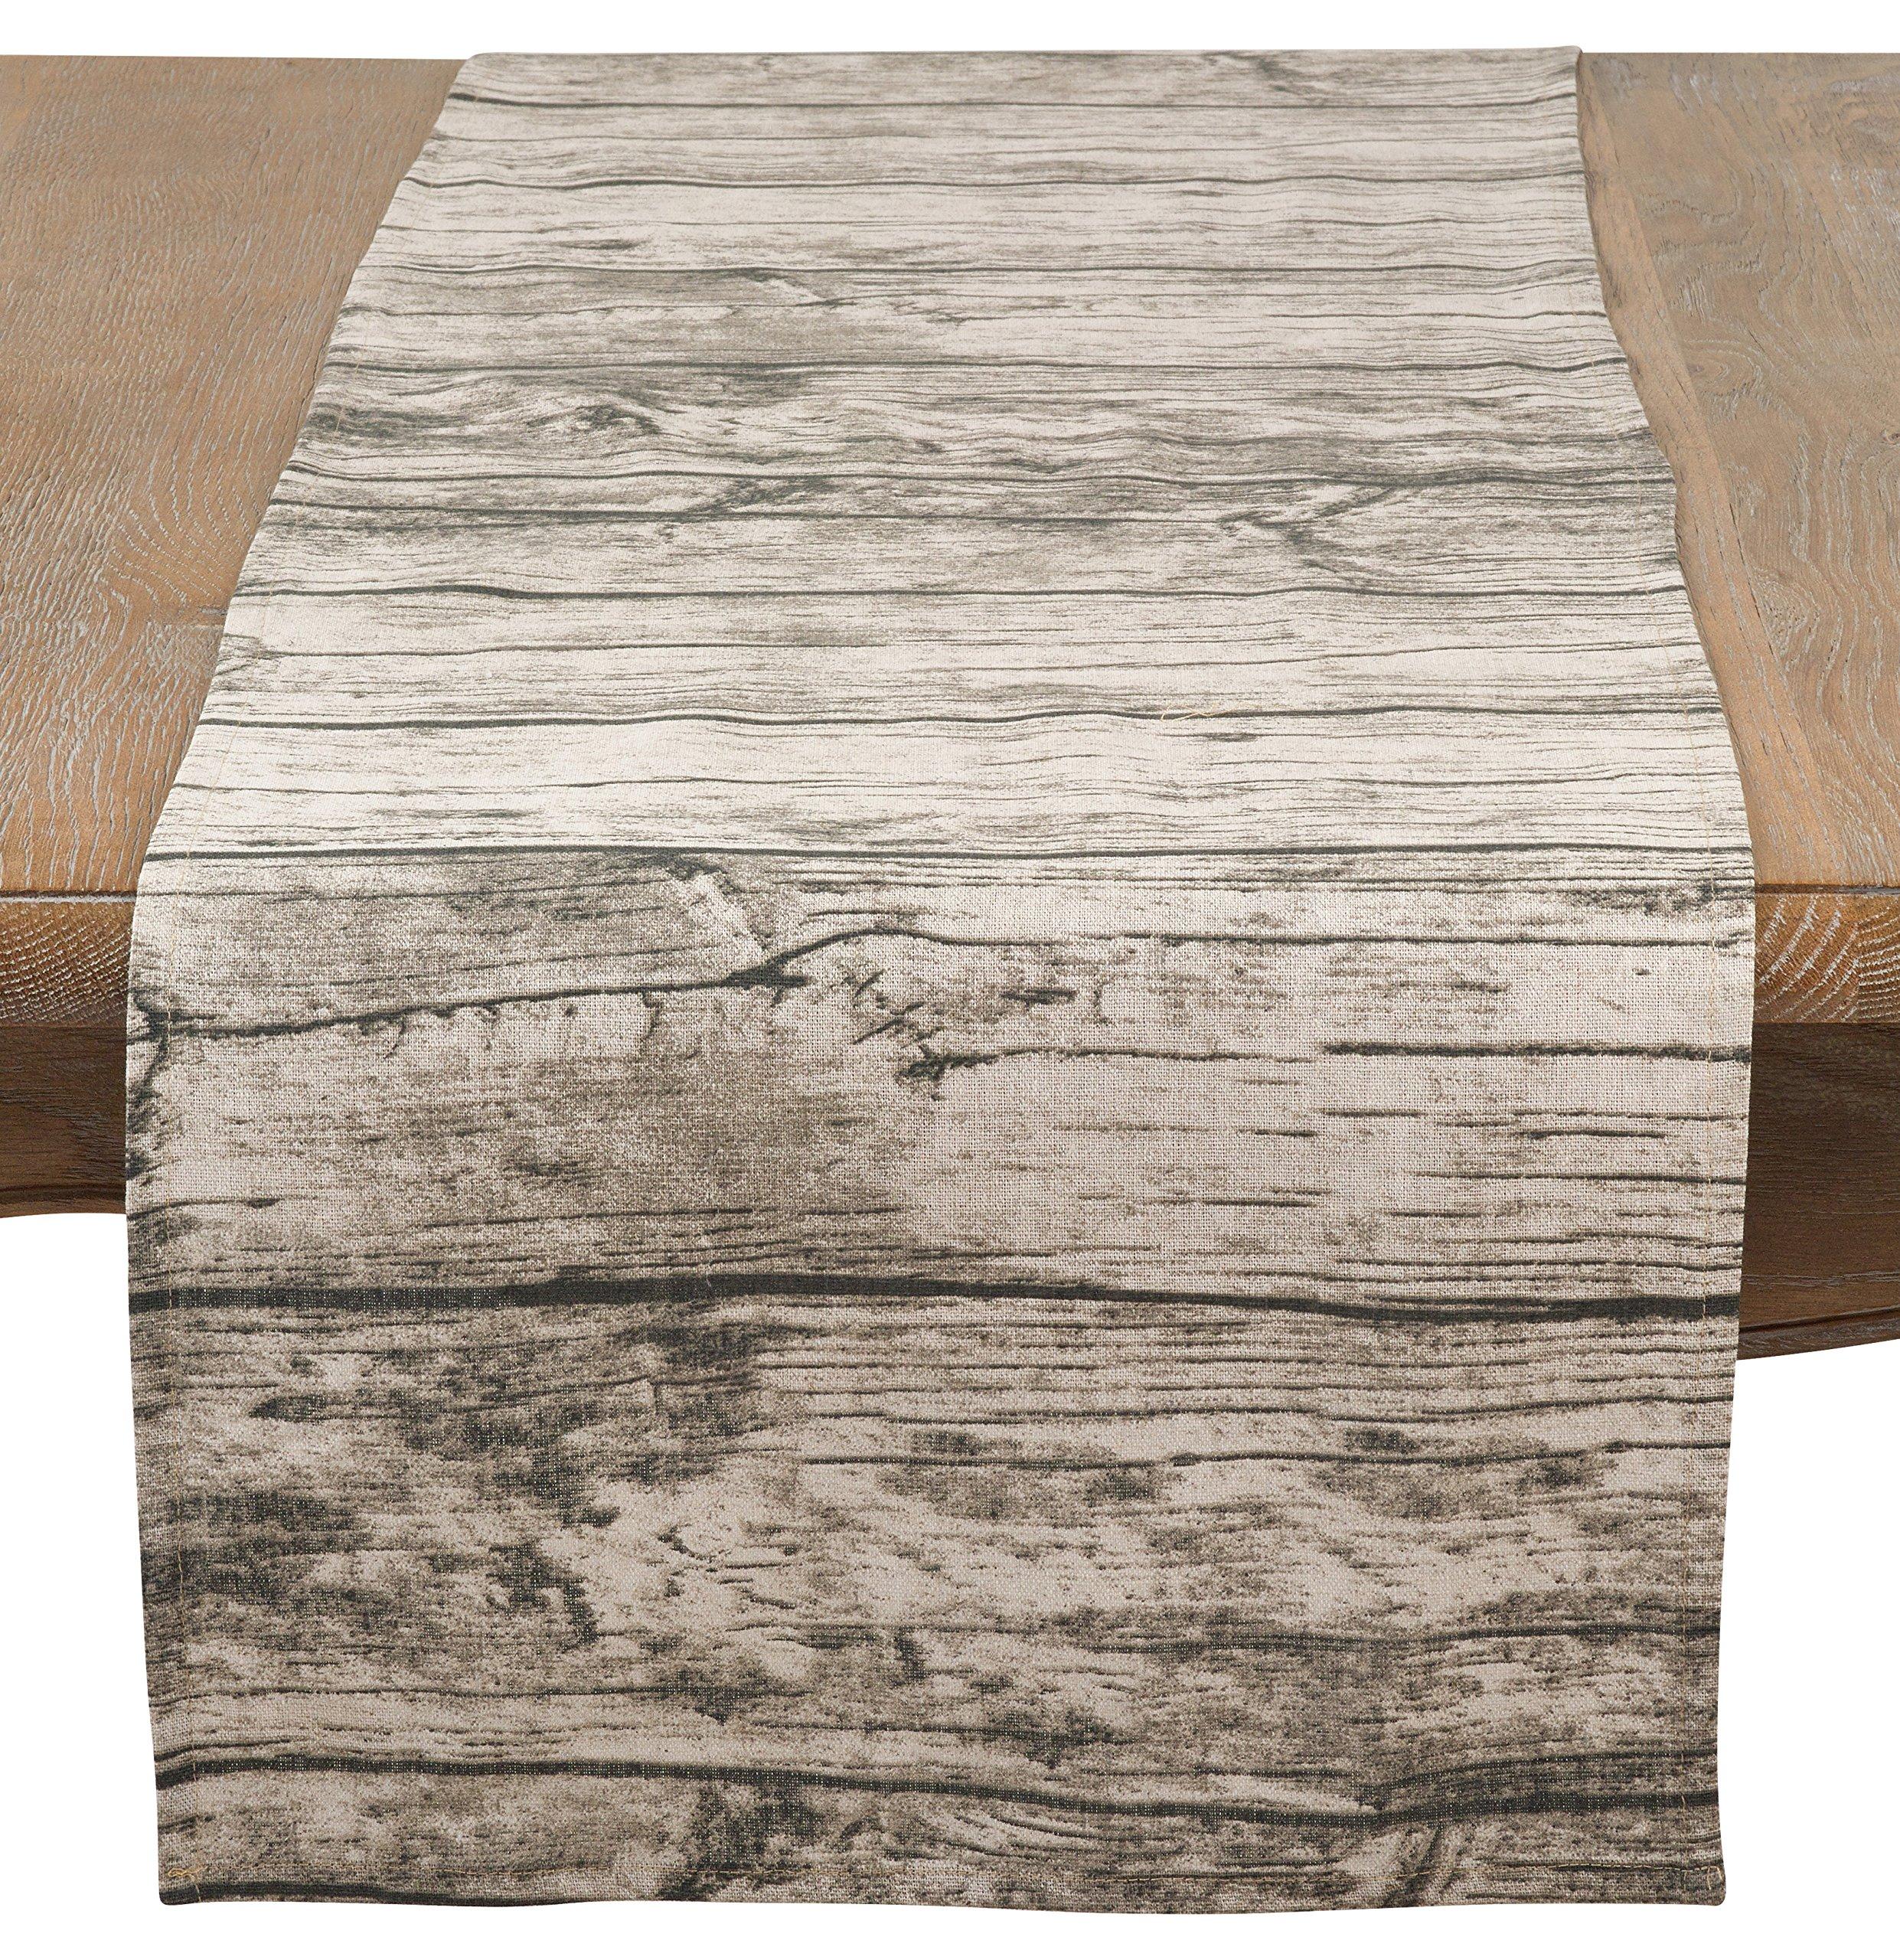 SARO LIFESTYLE Wood Plank Pattern Cotton Table Runner, 16'' x 72'', Natural